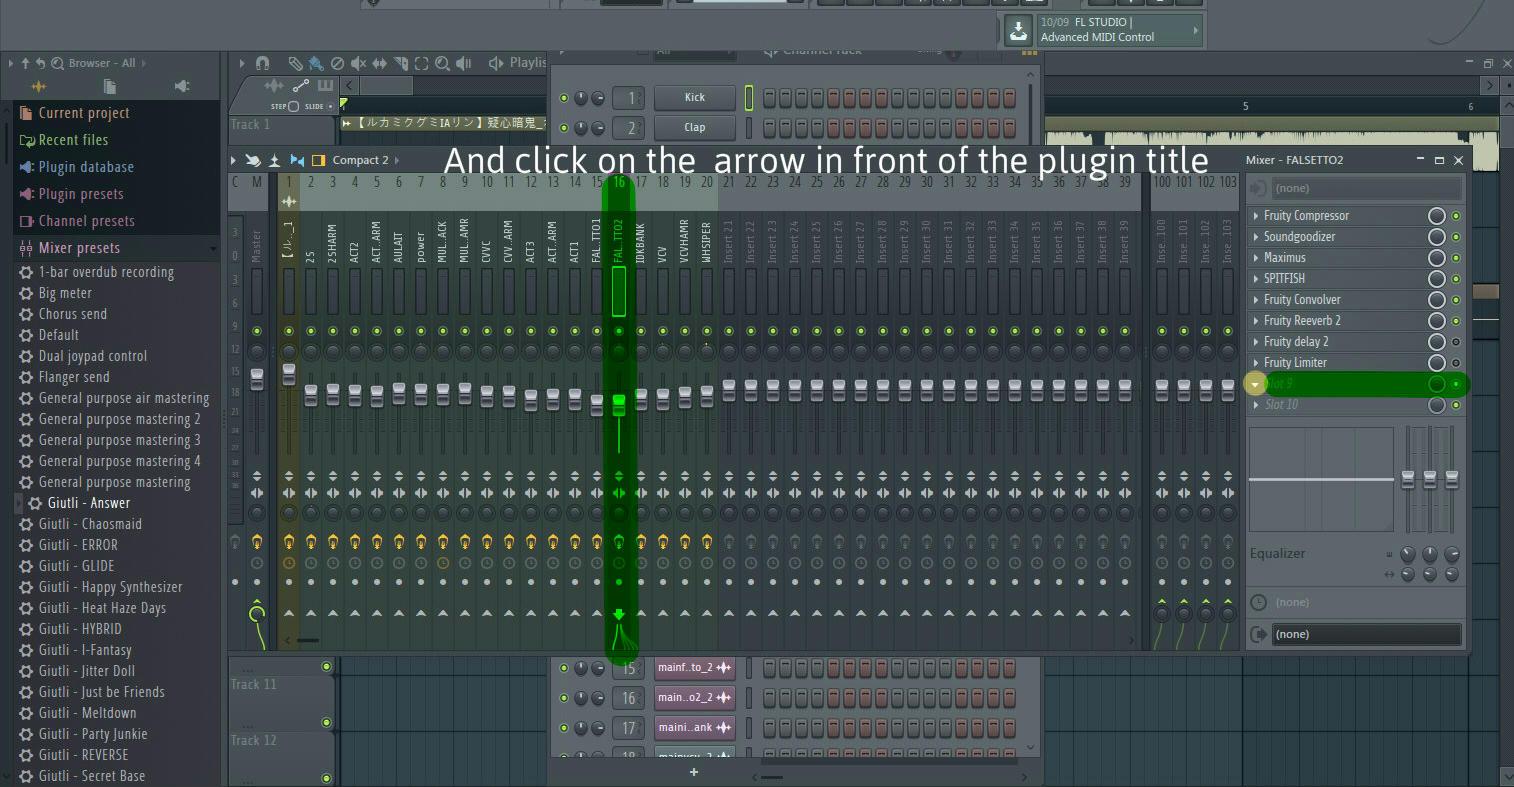 Fl studio mixer presets tutorial | How to Use the FL Studio